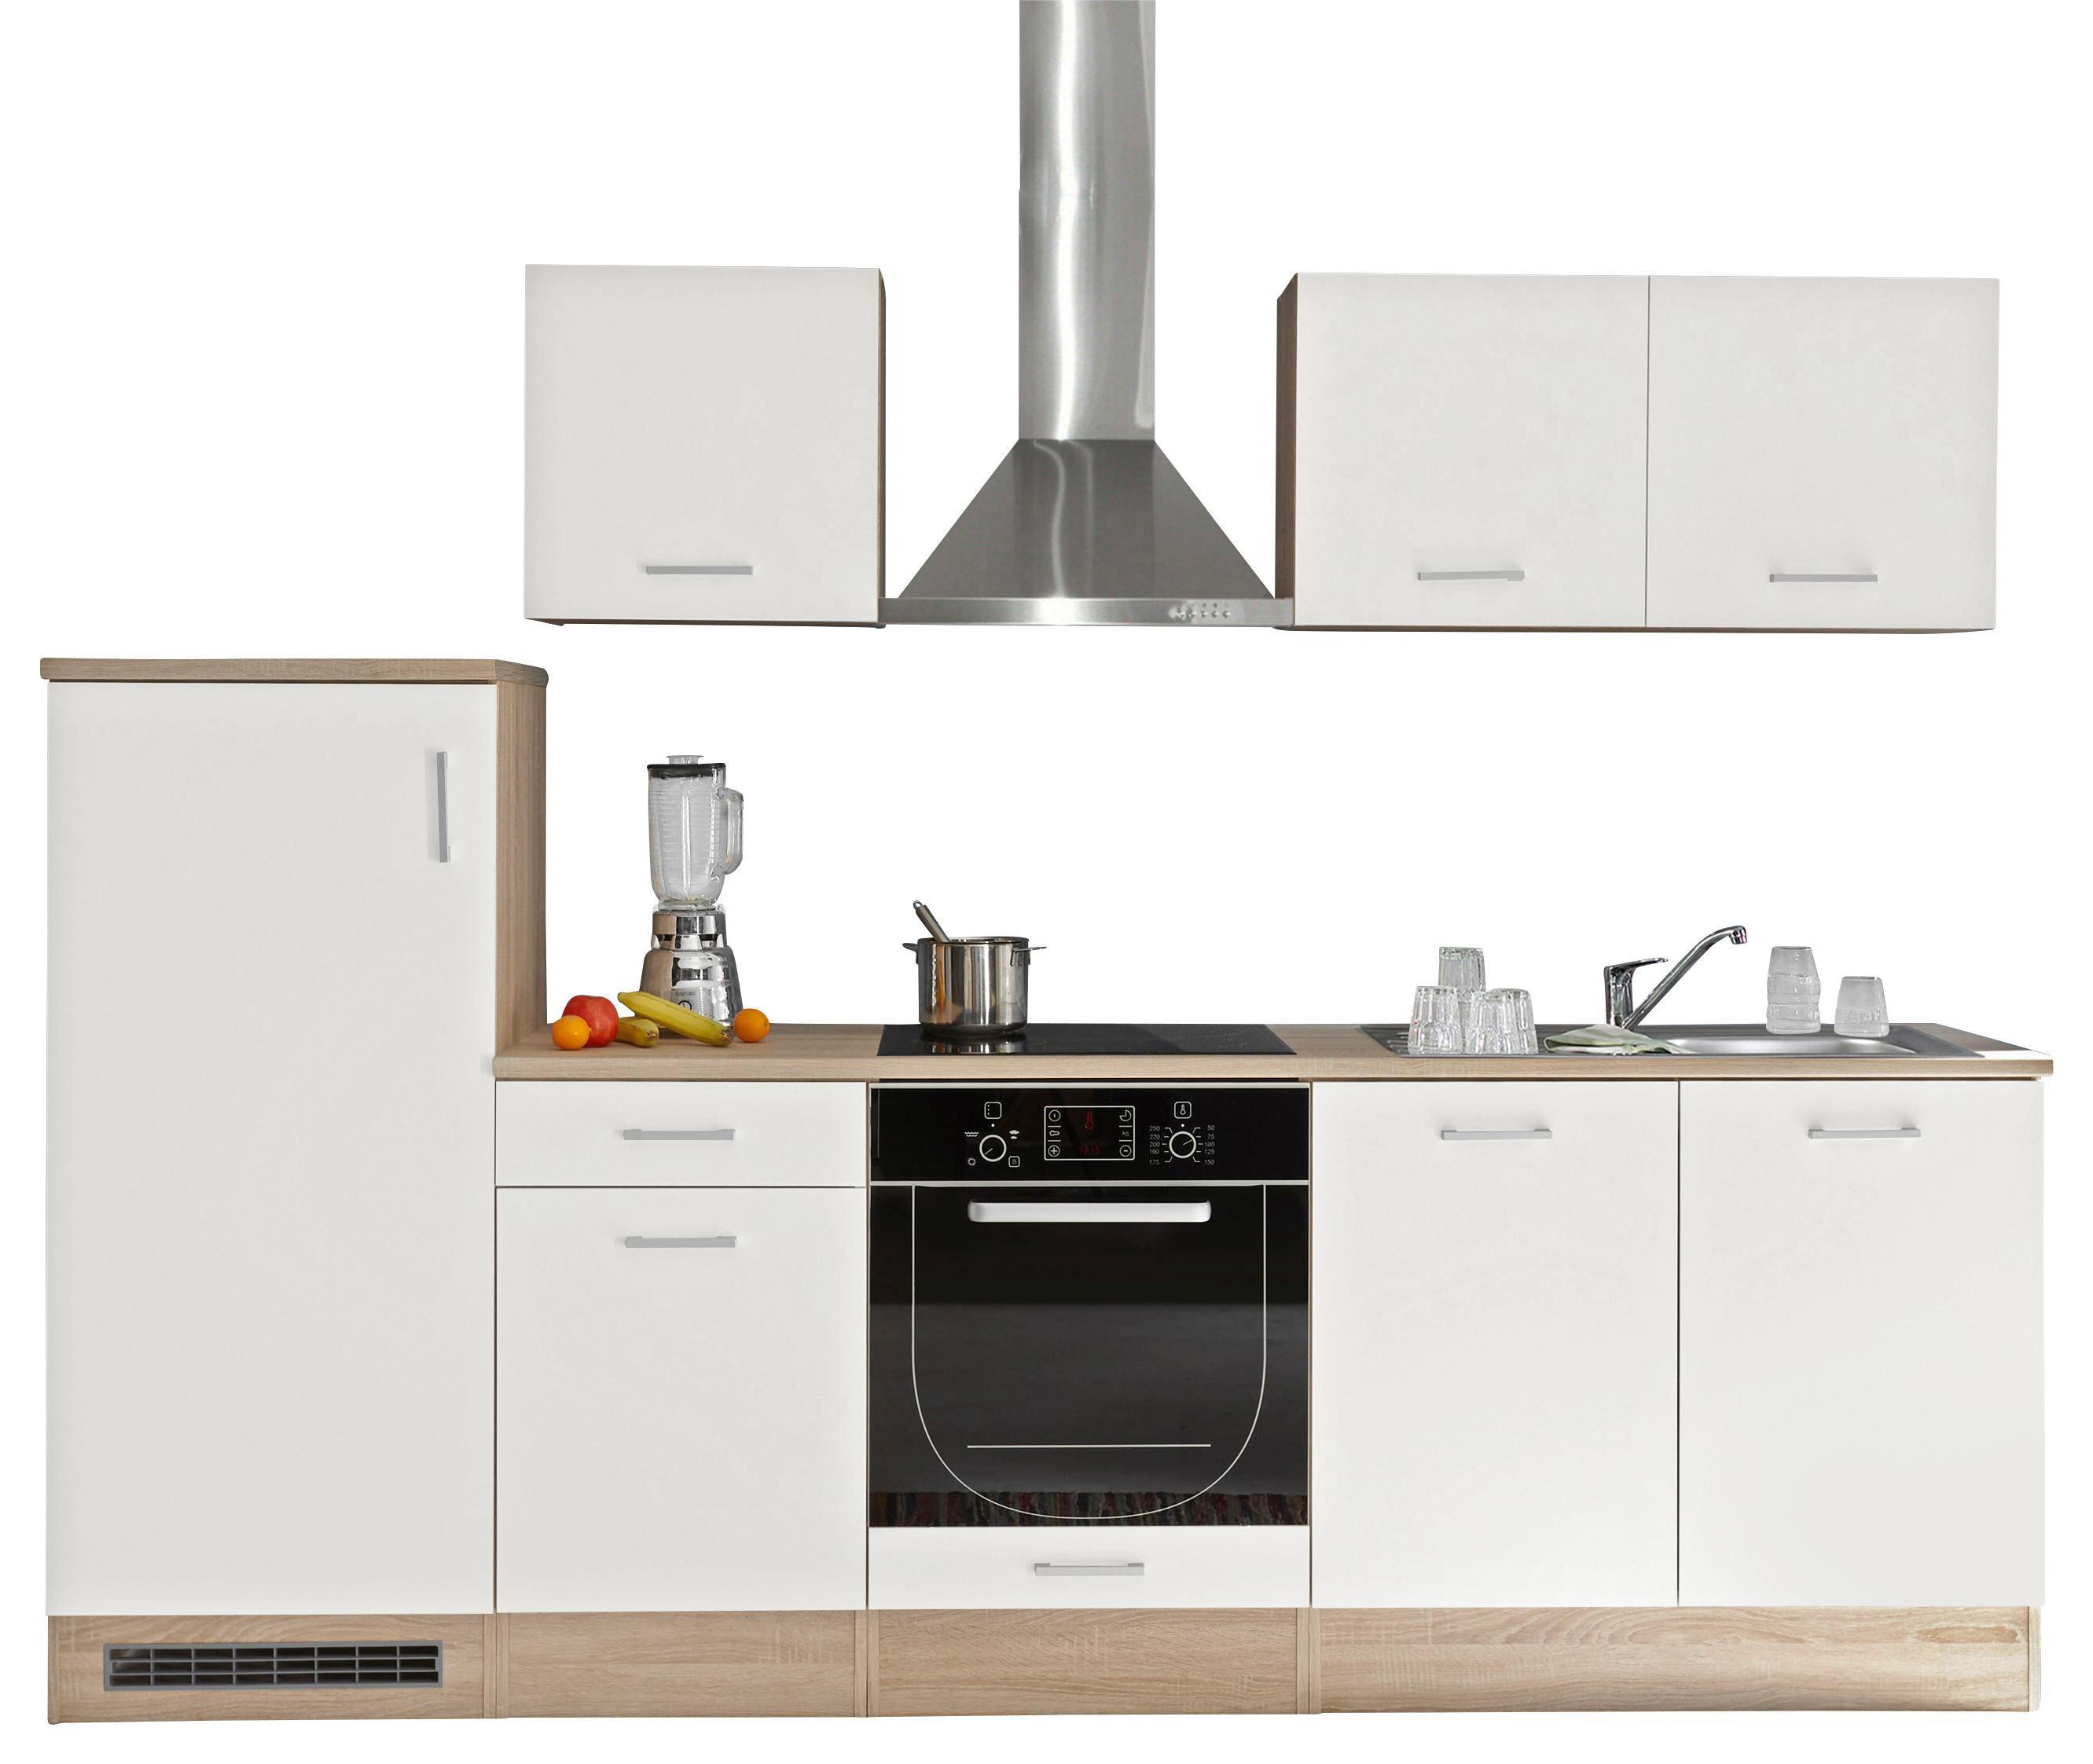 Mini Kühlschrank Möbelix : Küchenblock welcome andy cm weiß online kaufen ➤ möbelix